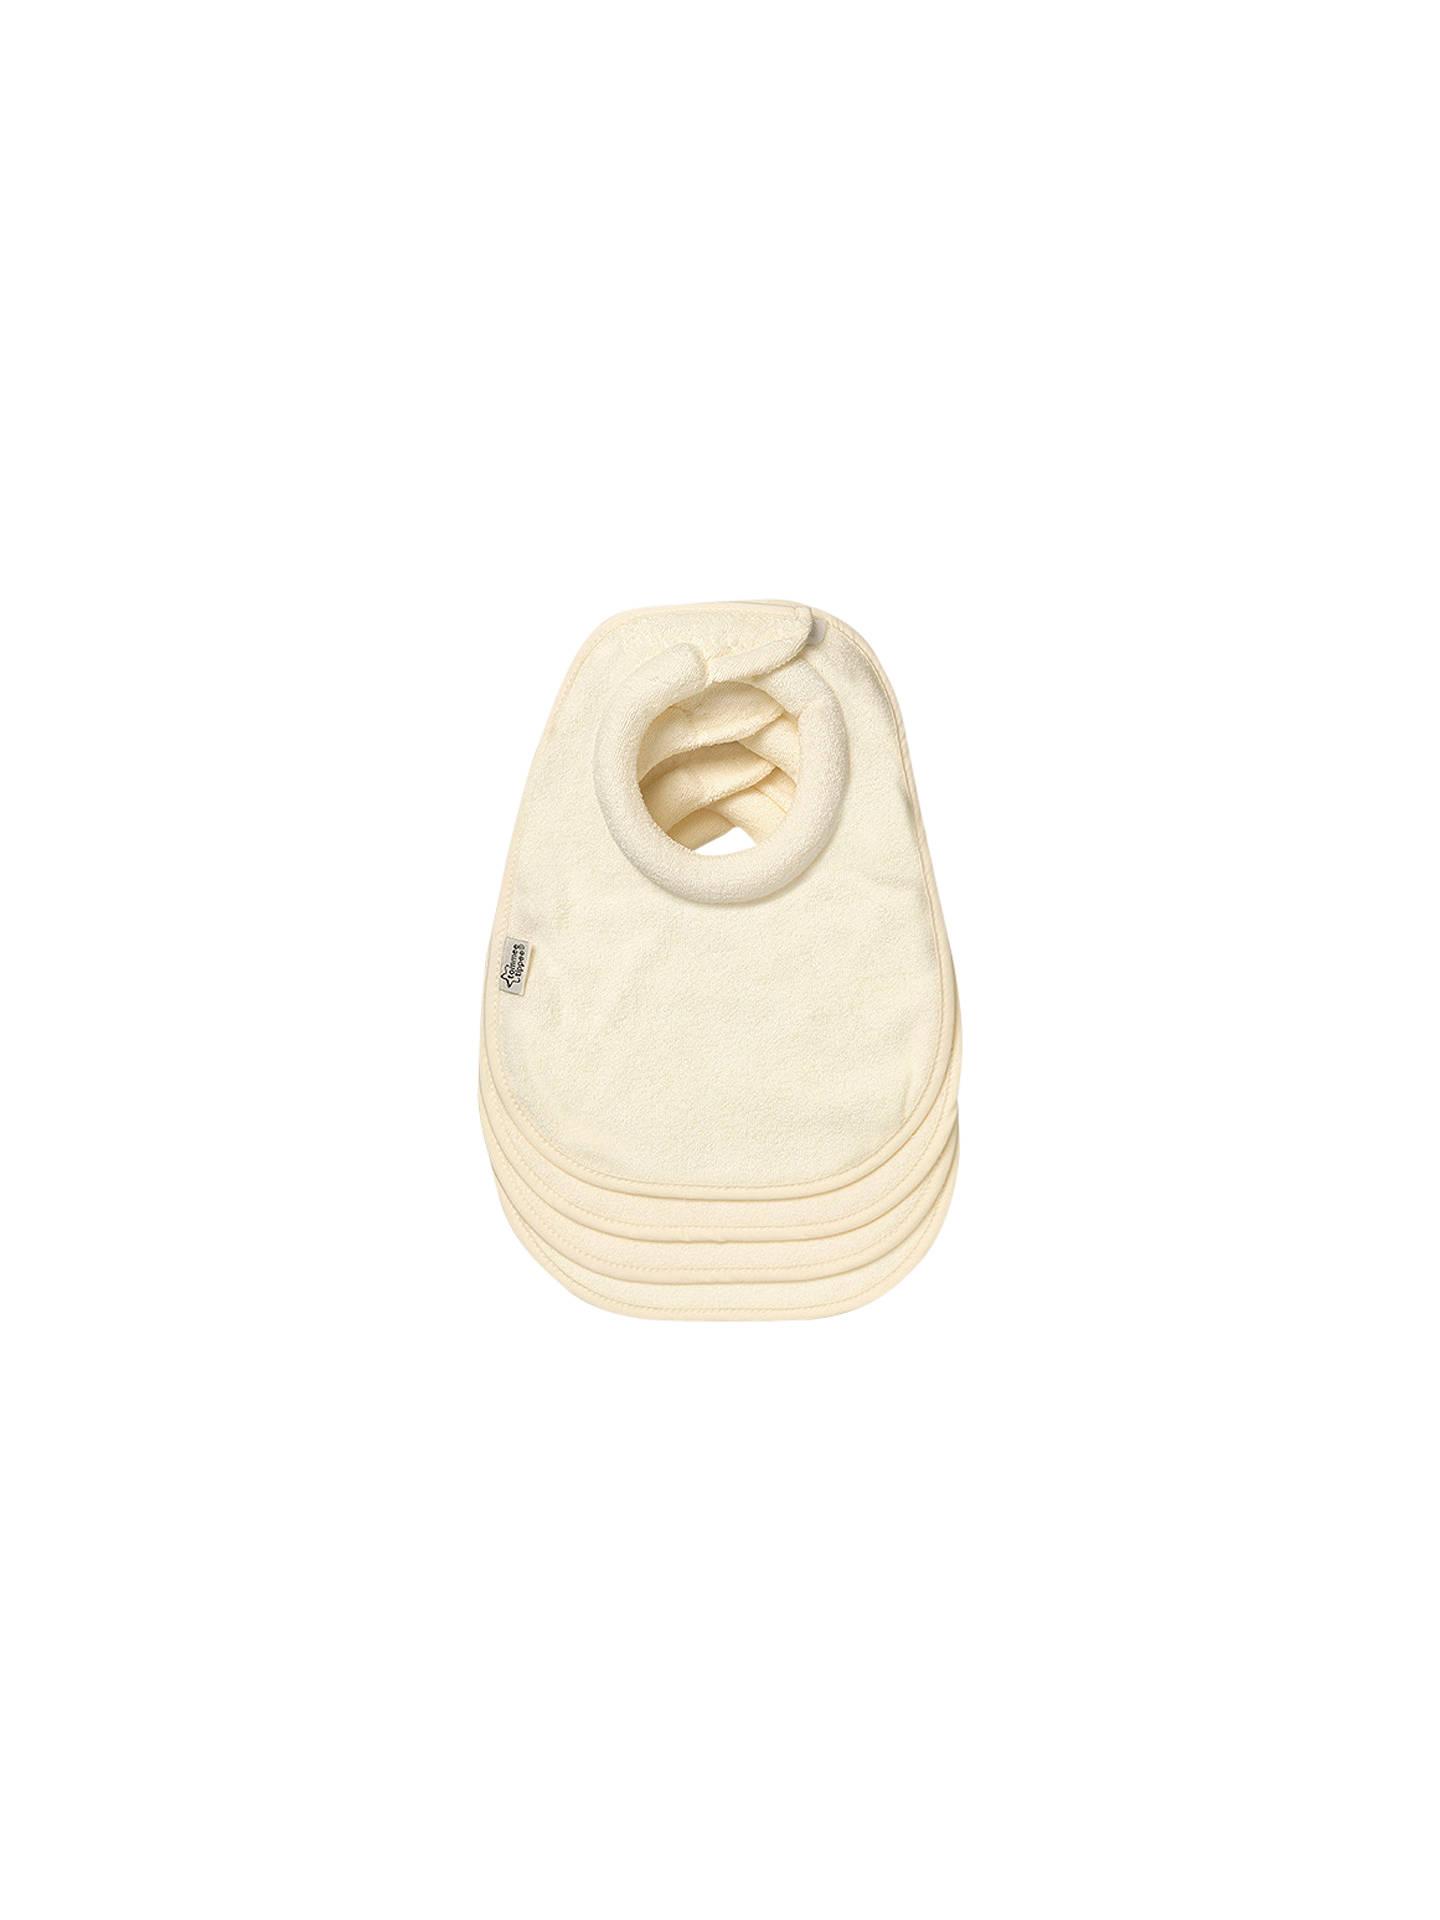 Tommee Tippee Milk Feeding Bibs Pack Of 4 Cream At John Lewis Baby Scissor With Cover Buytommee Online